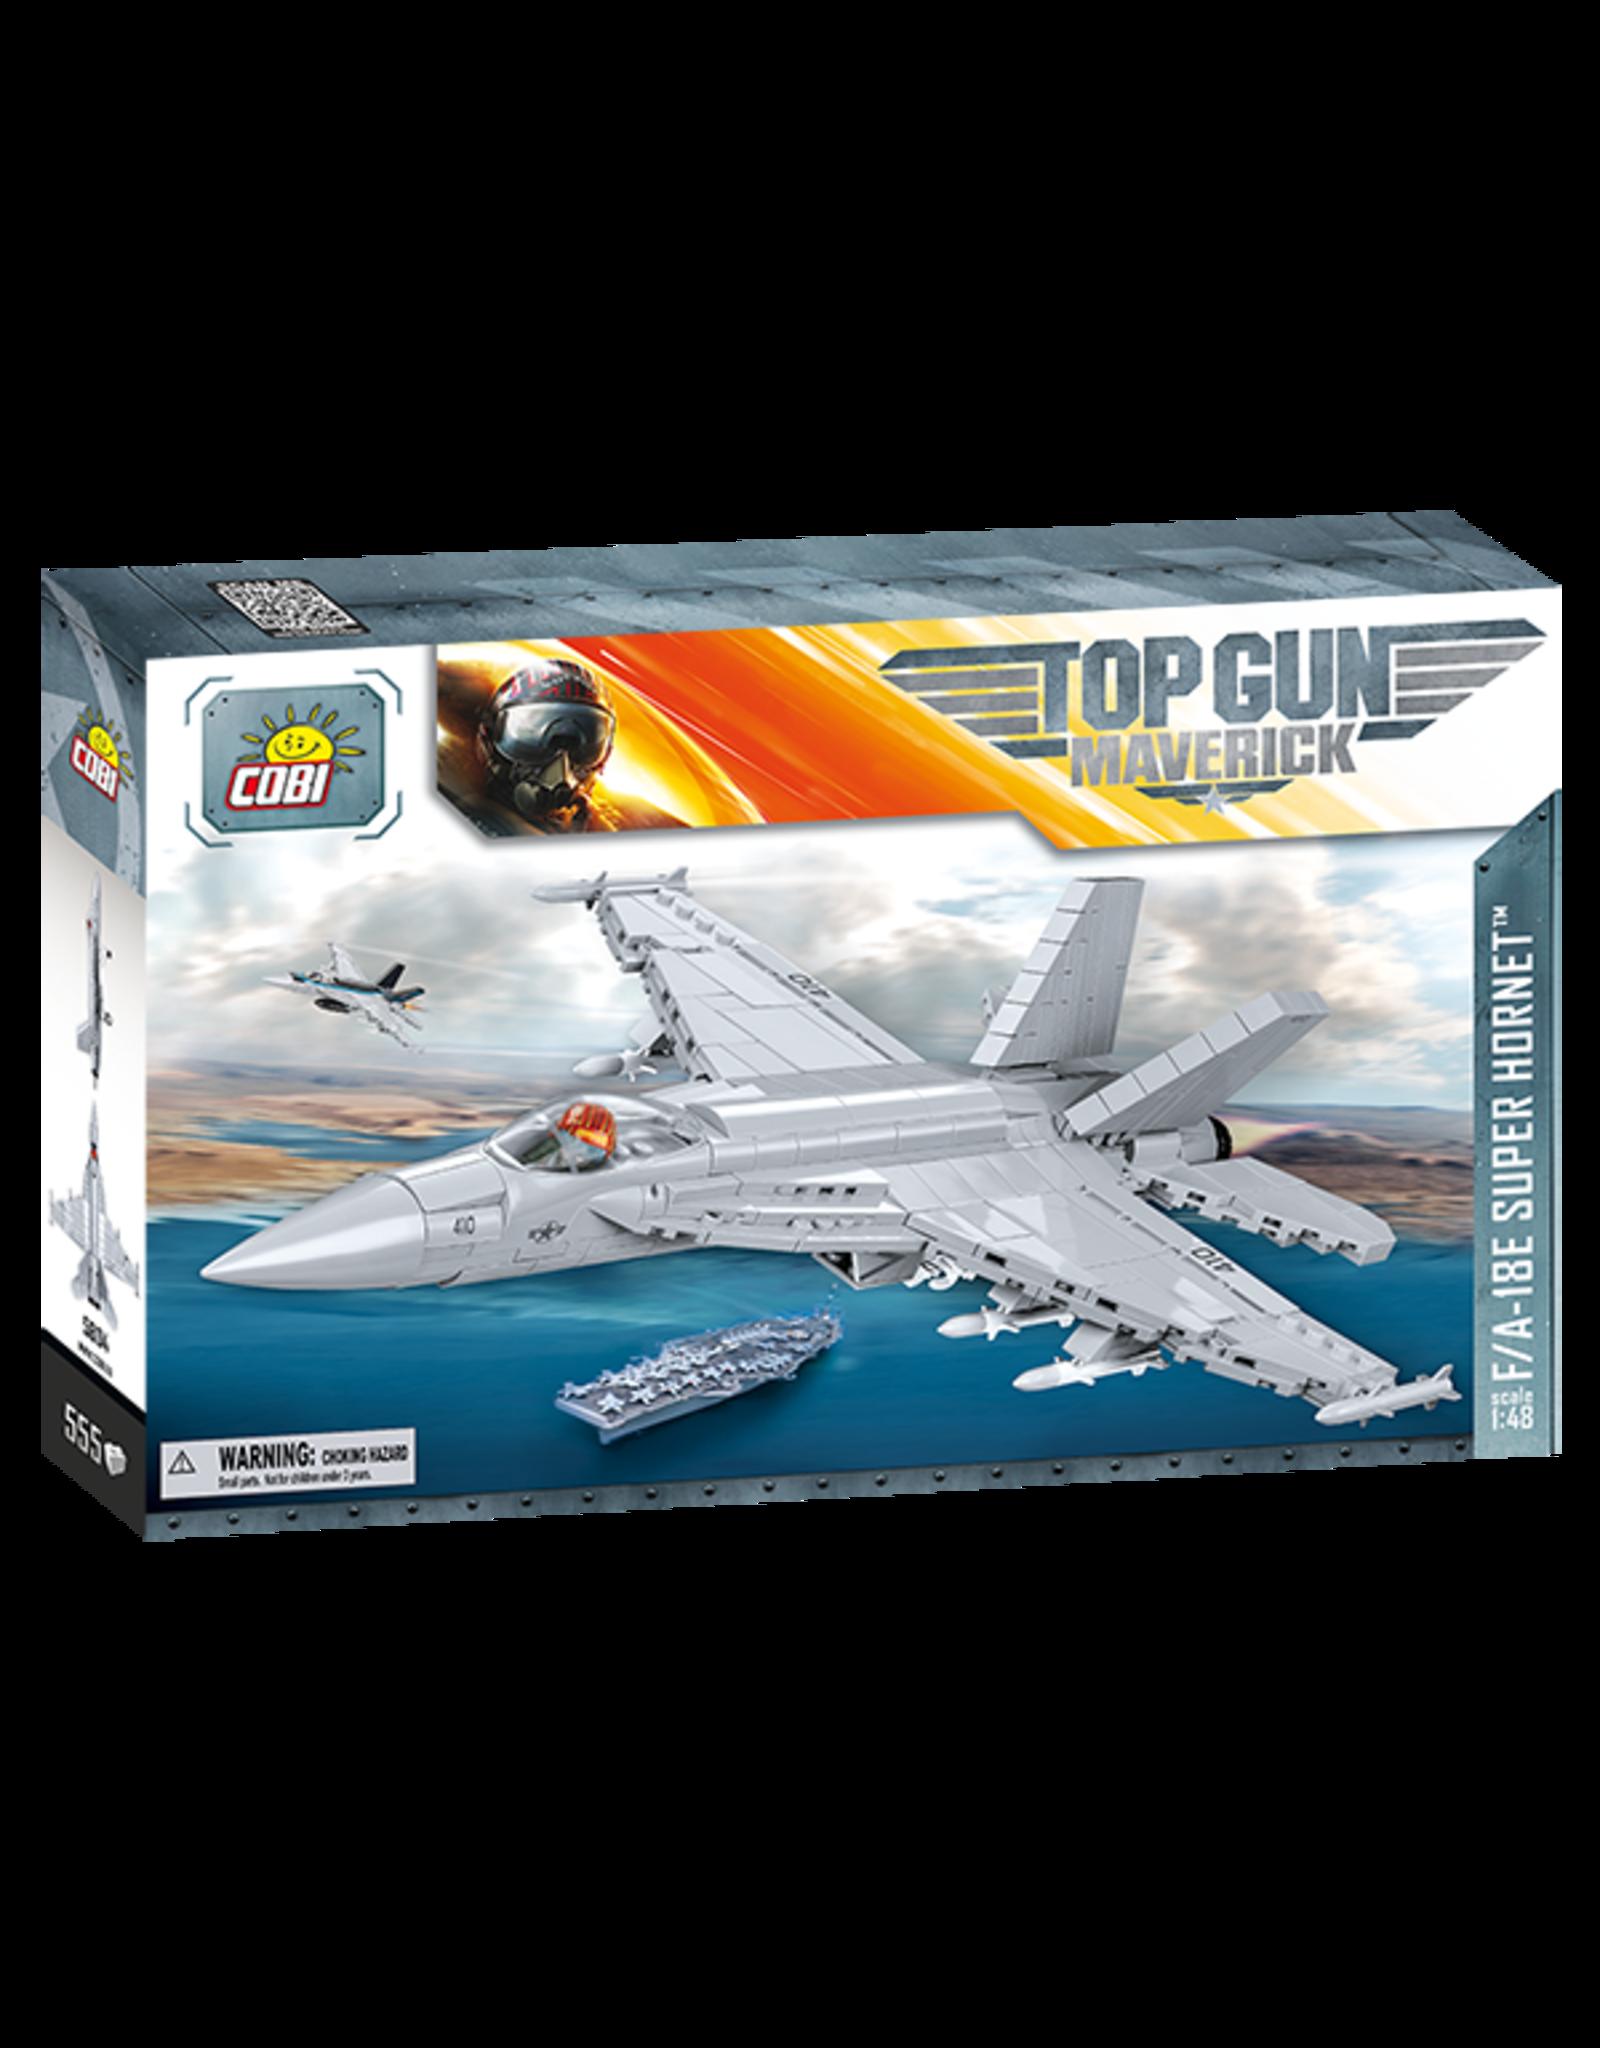 COBI COBI 5804 TOP GUN F/A-18E Super Hornet